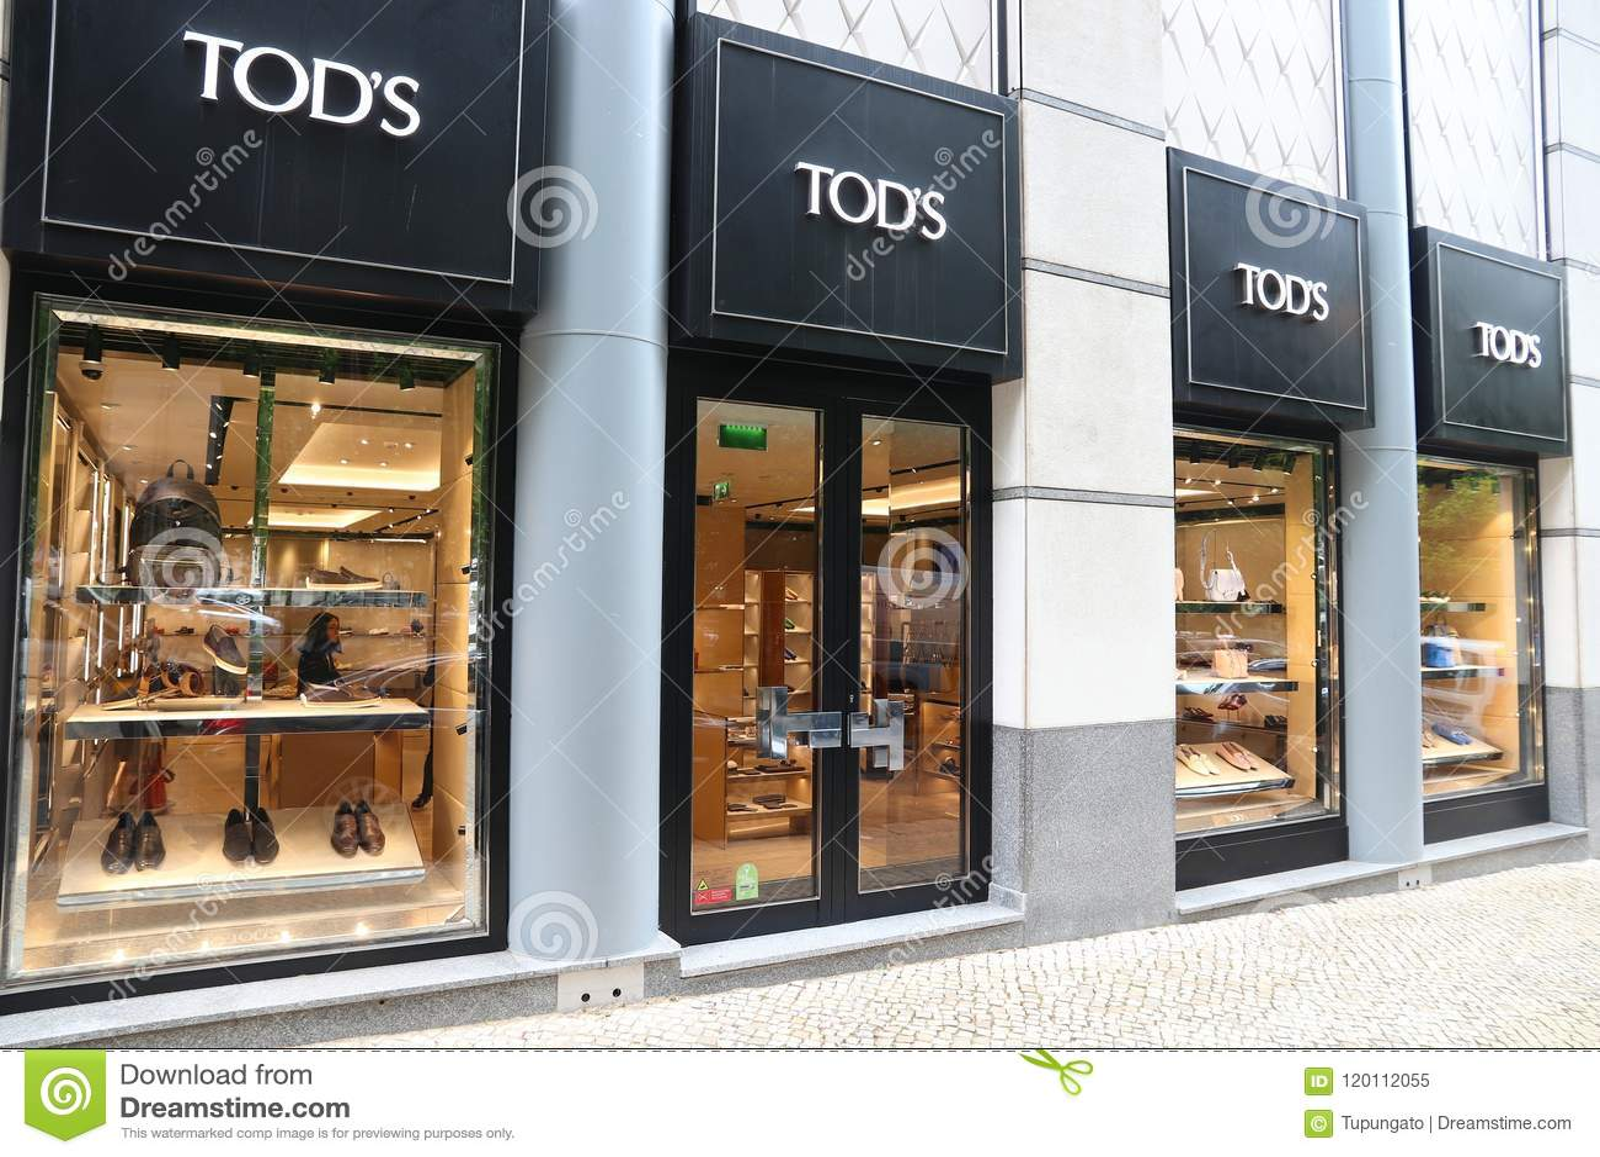 Tod s fashion brand